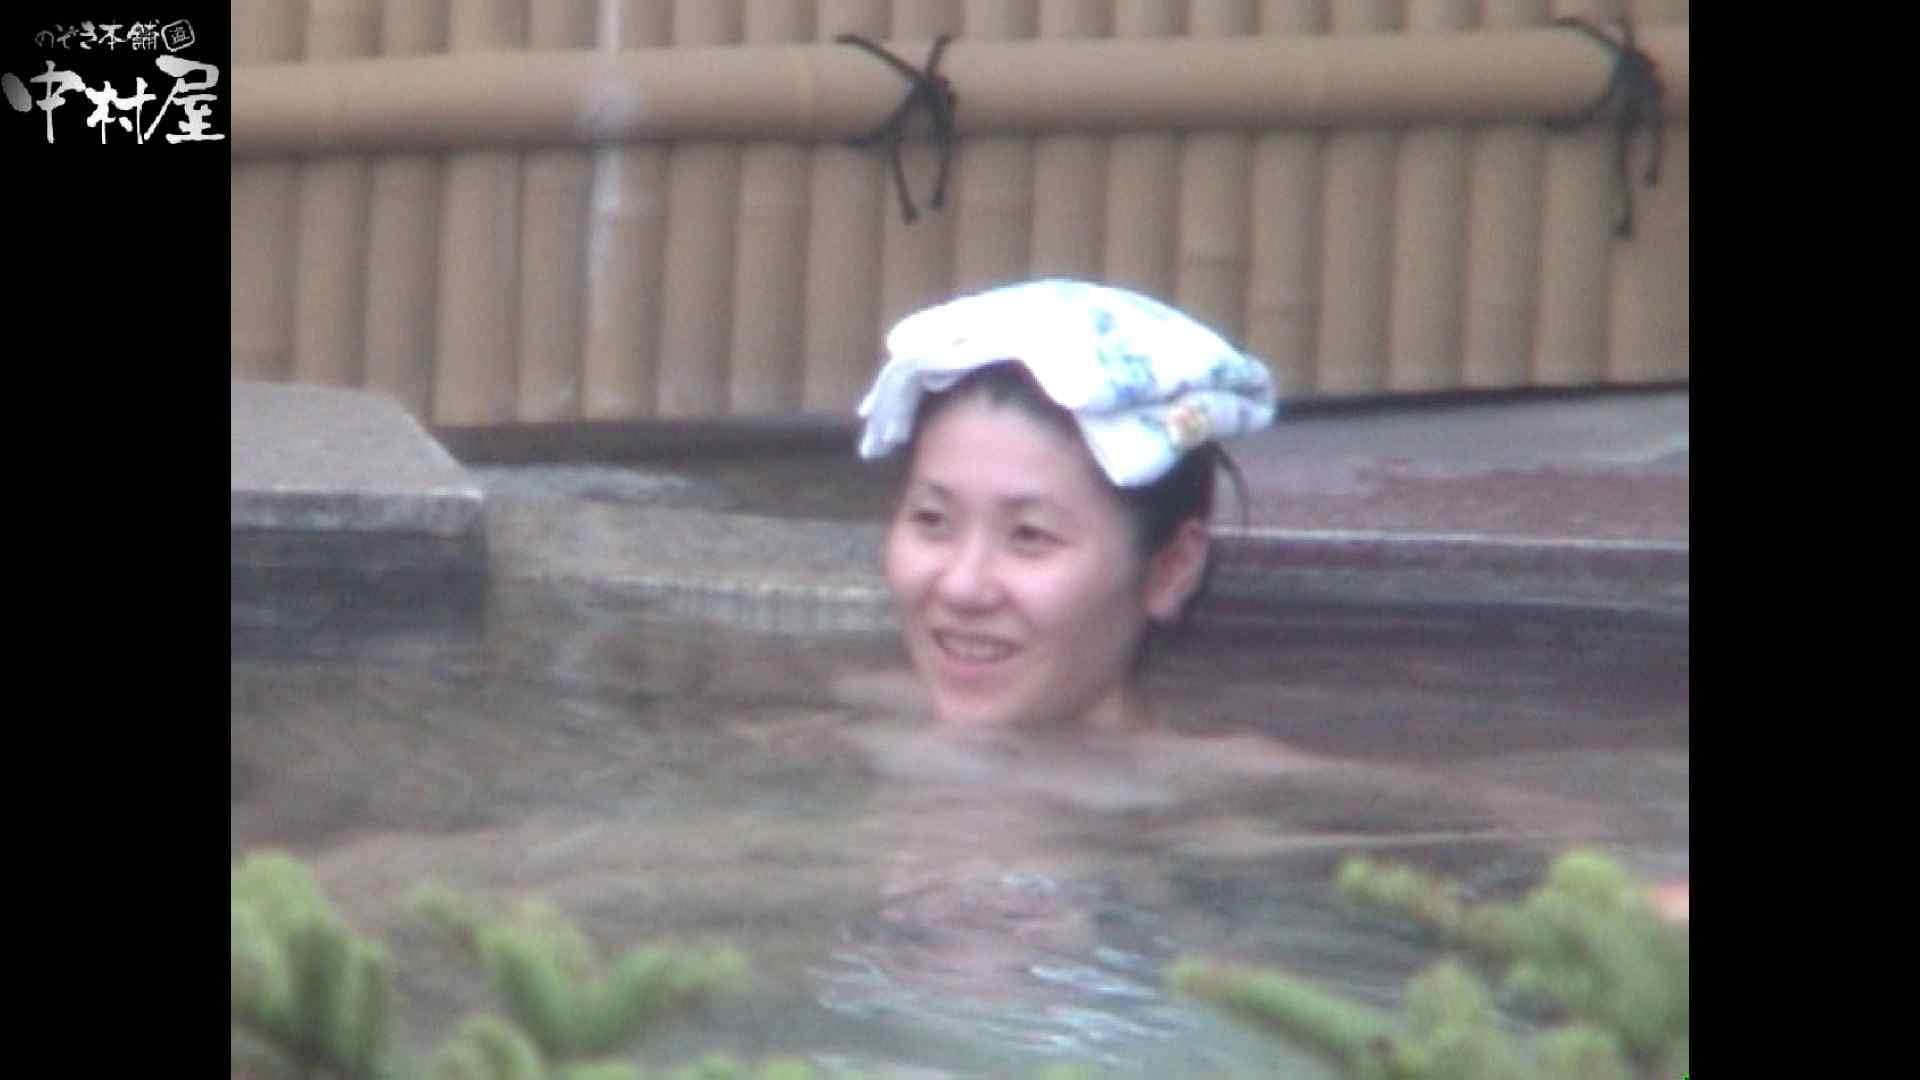 Aquaな露天風呂Vol.925 盗撮   HなOL  104pic 90